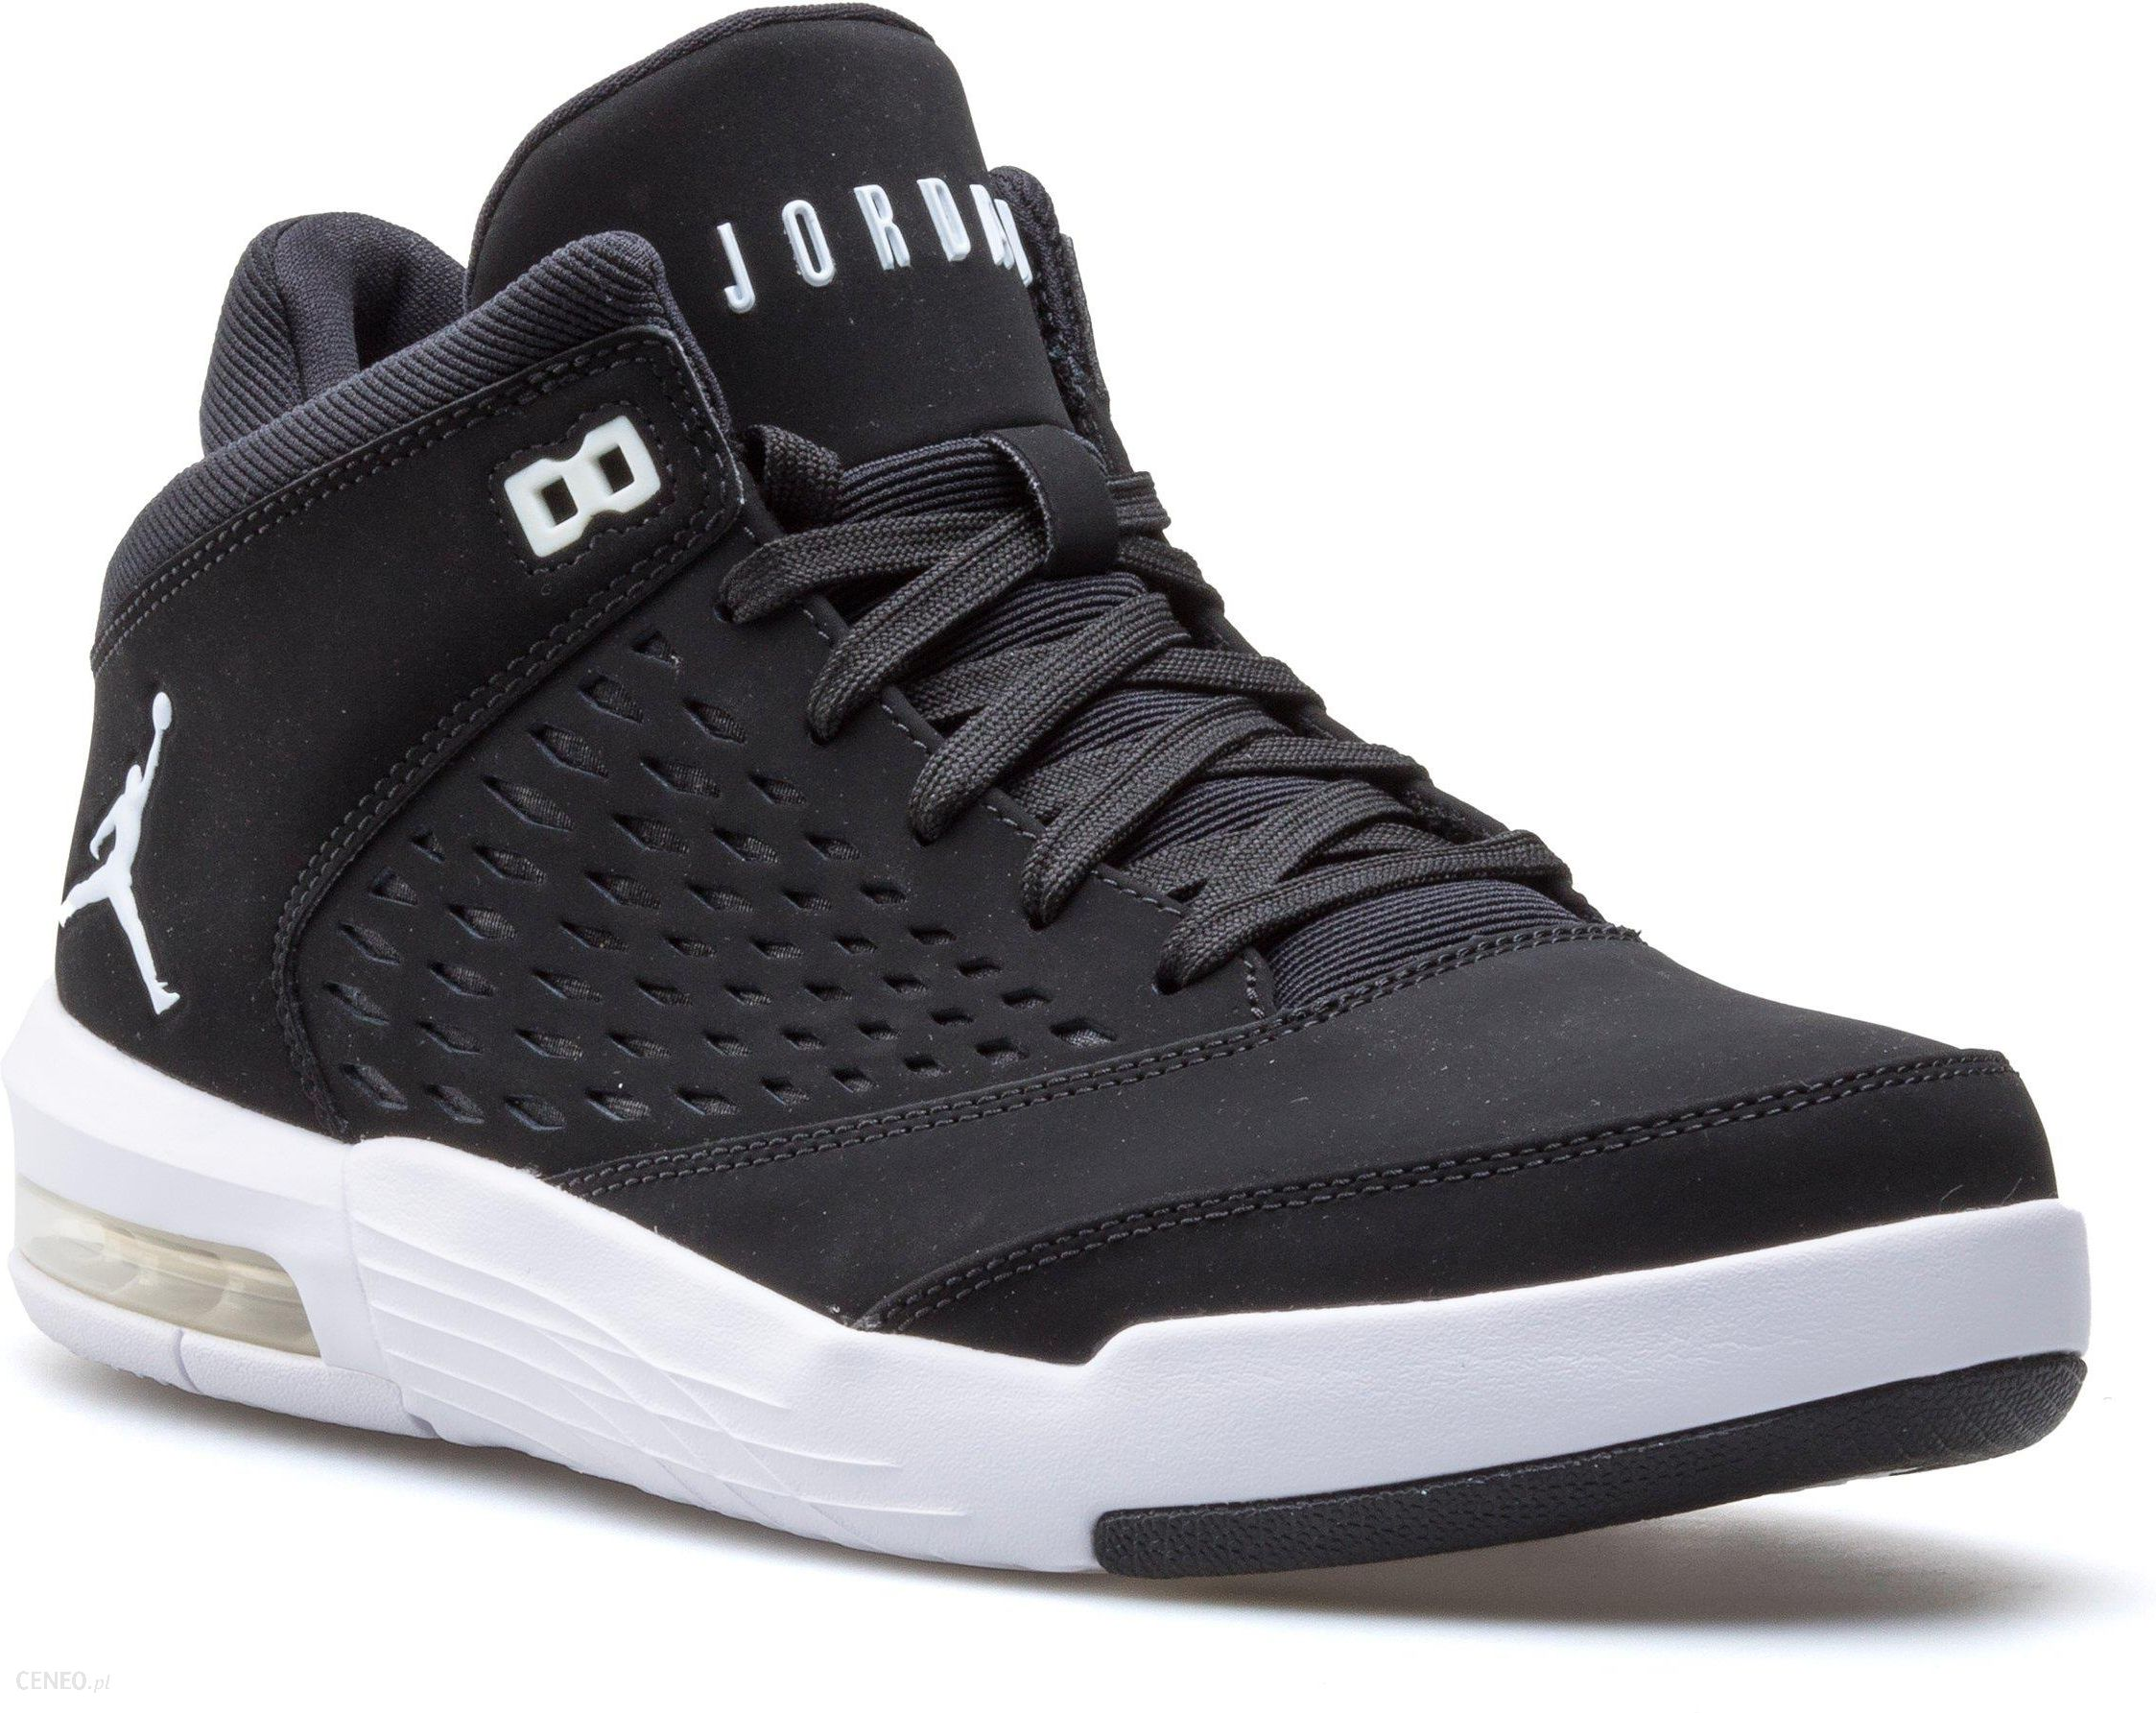 Buty Nike Jordan Flight Origin 921196 001 r. 45 Ceny i opinie Ceneo.pl